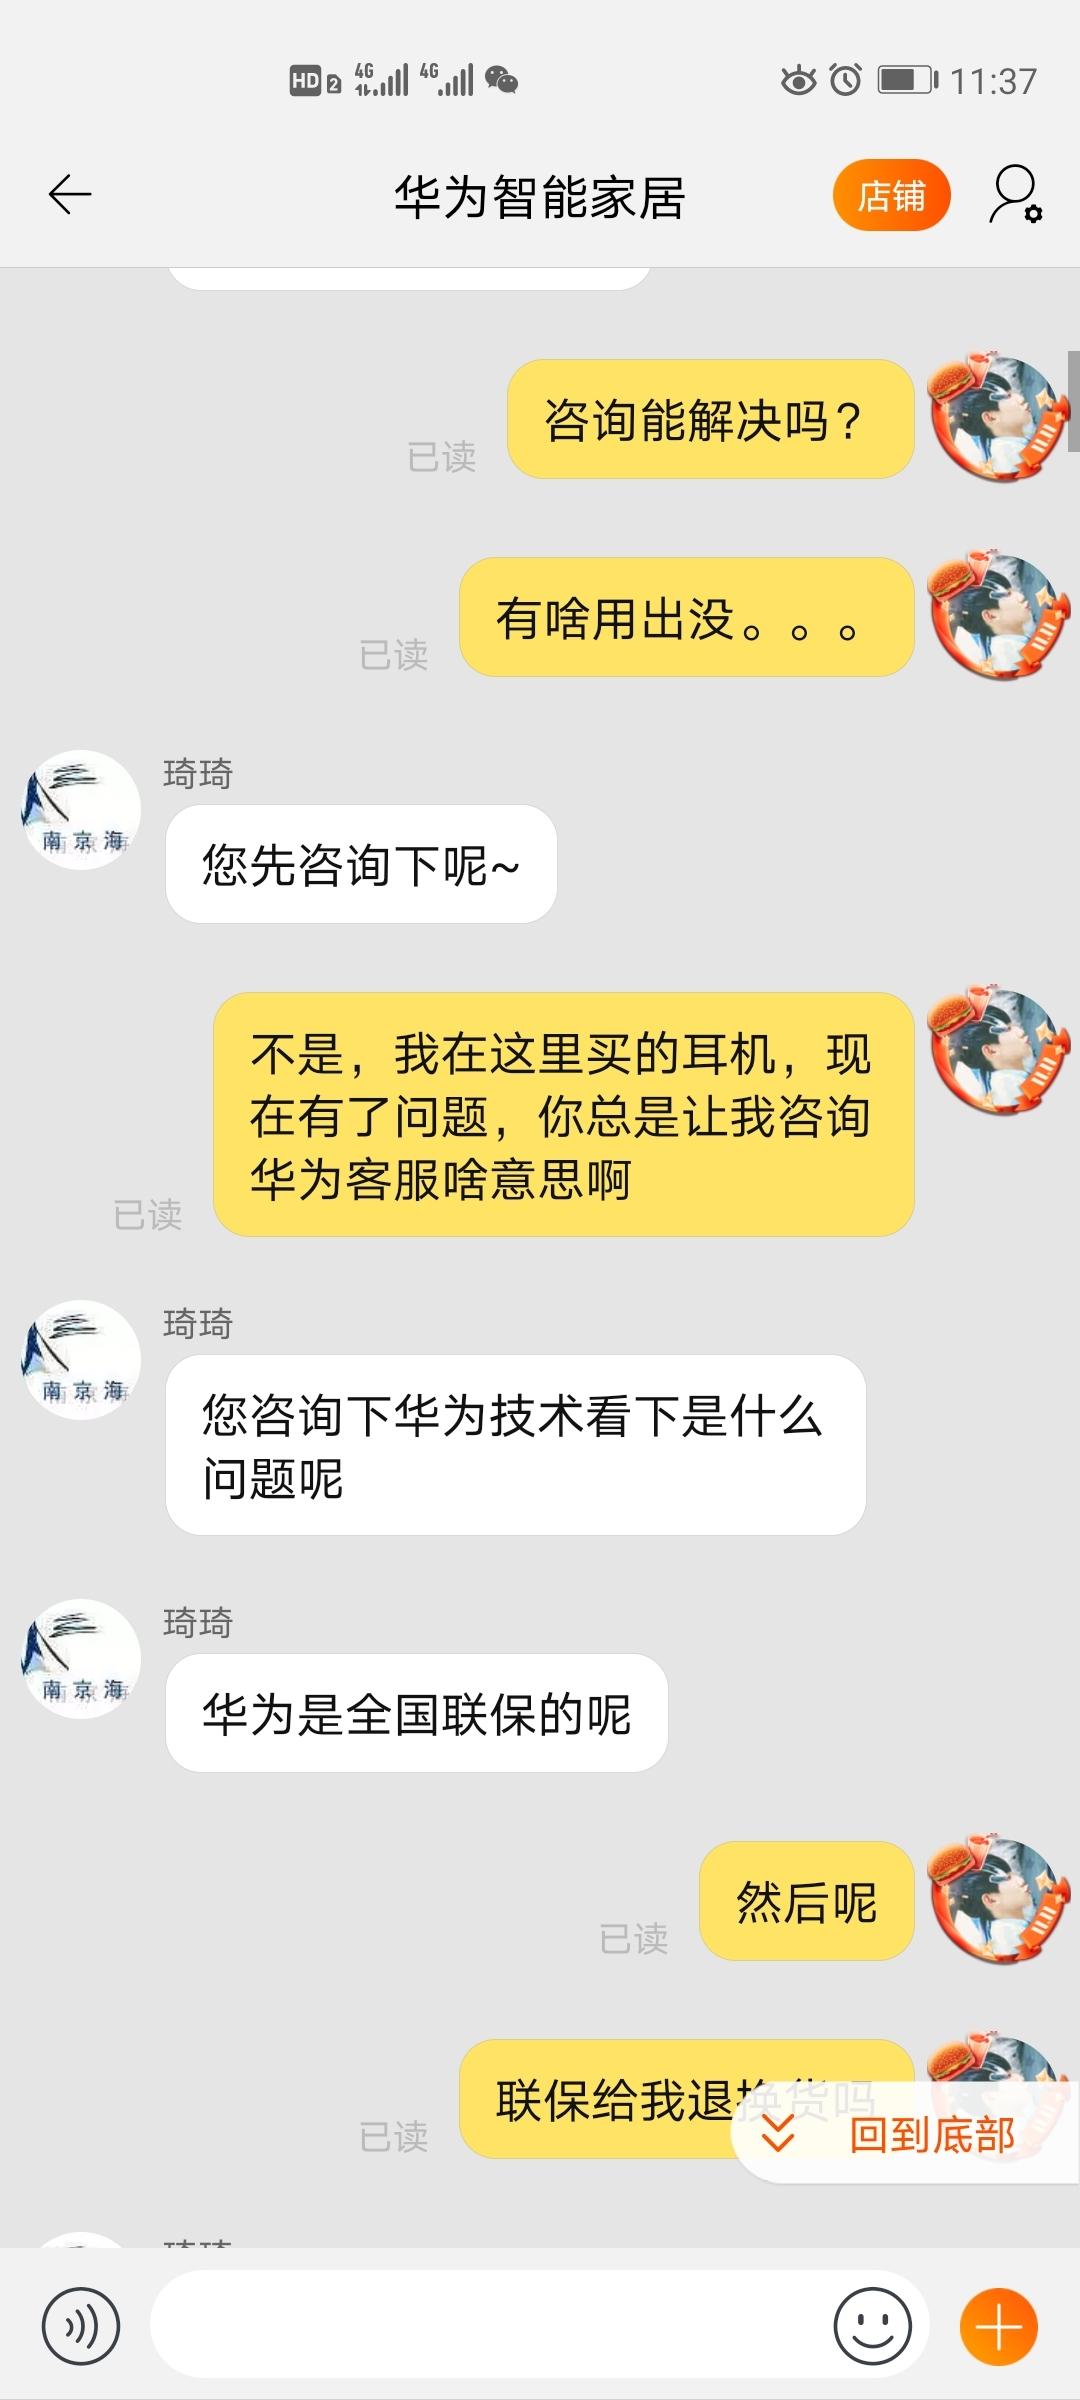 Screenshot_20200508_113707_com.taobao.taobao.jpg